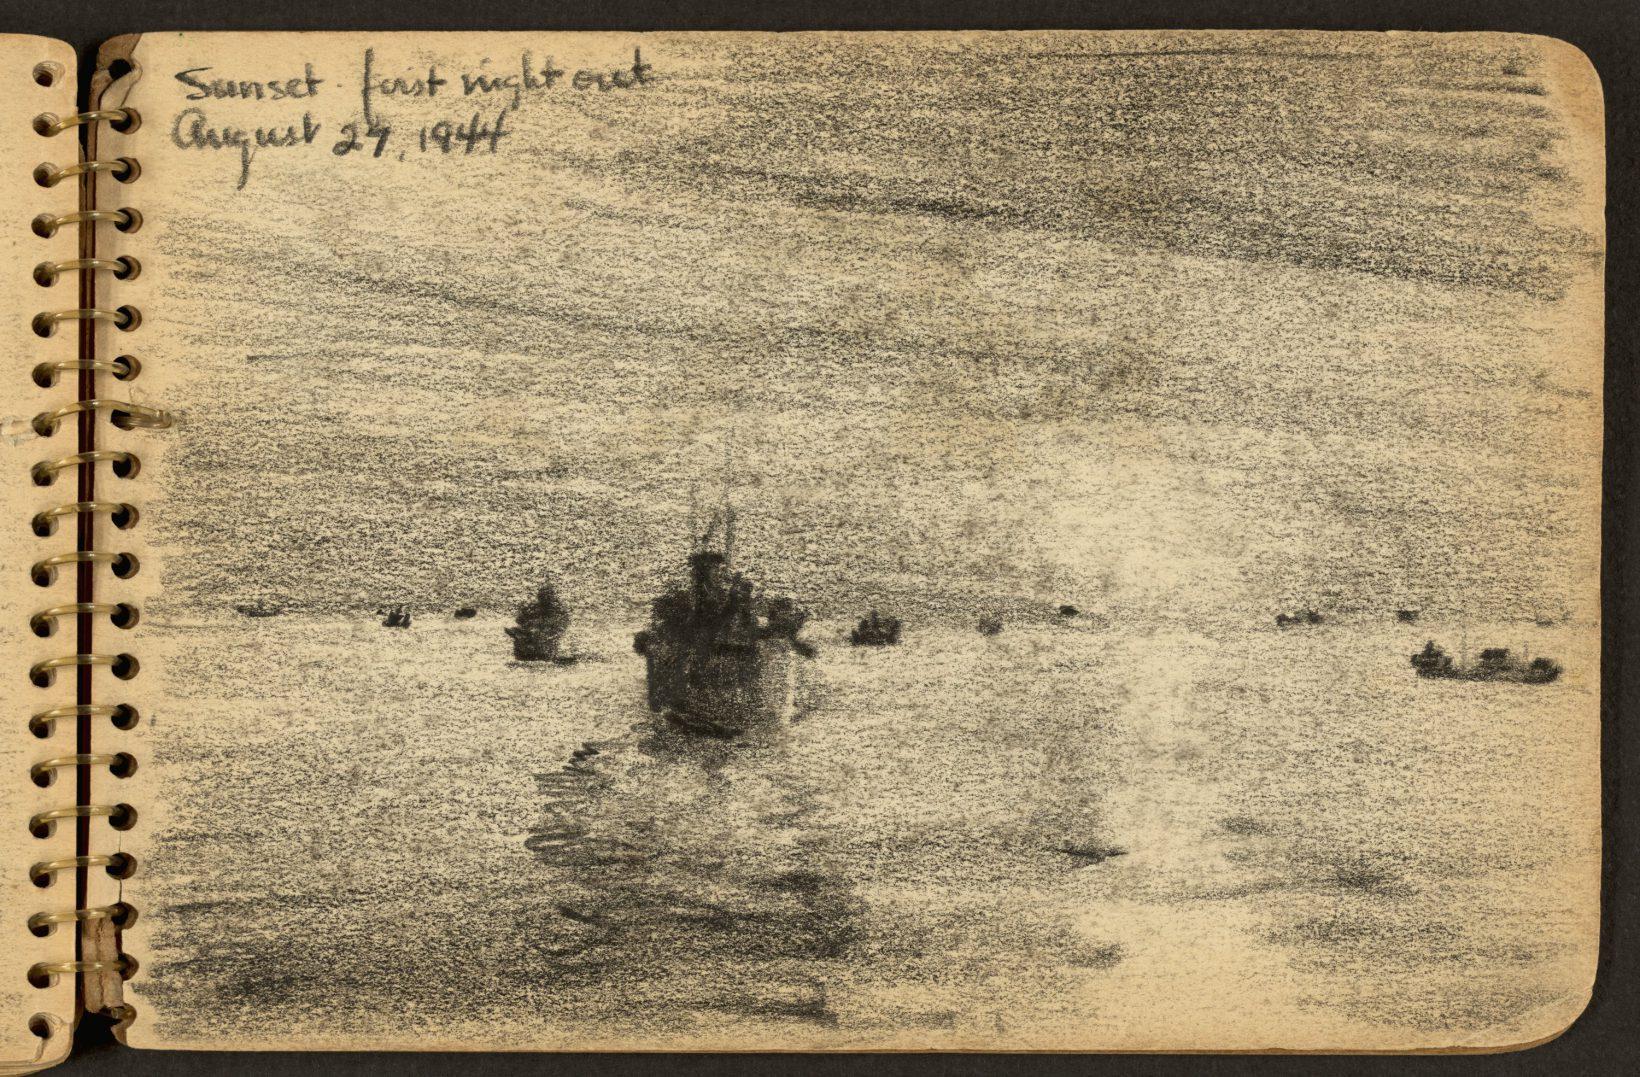 victor-lundy-carnet-croquis-seconde-guerre-mondiale-33